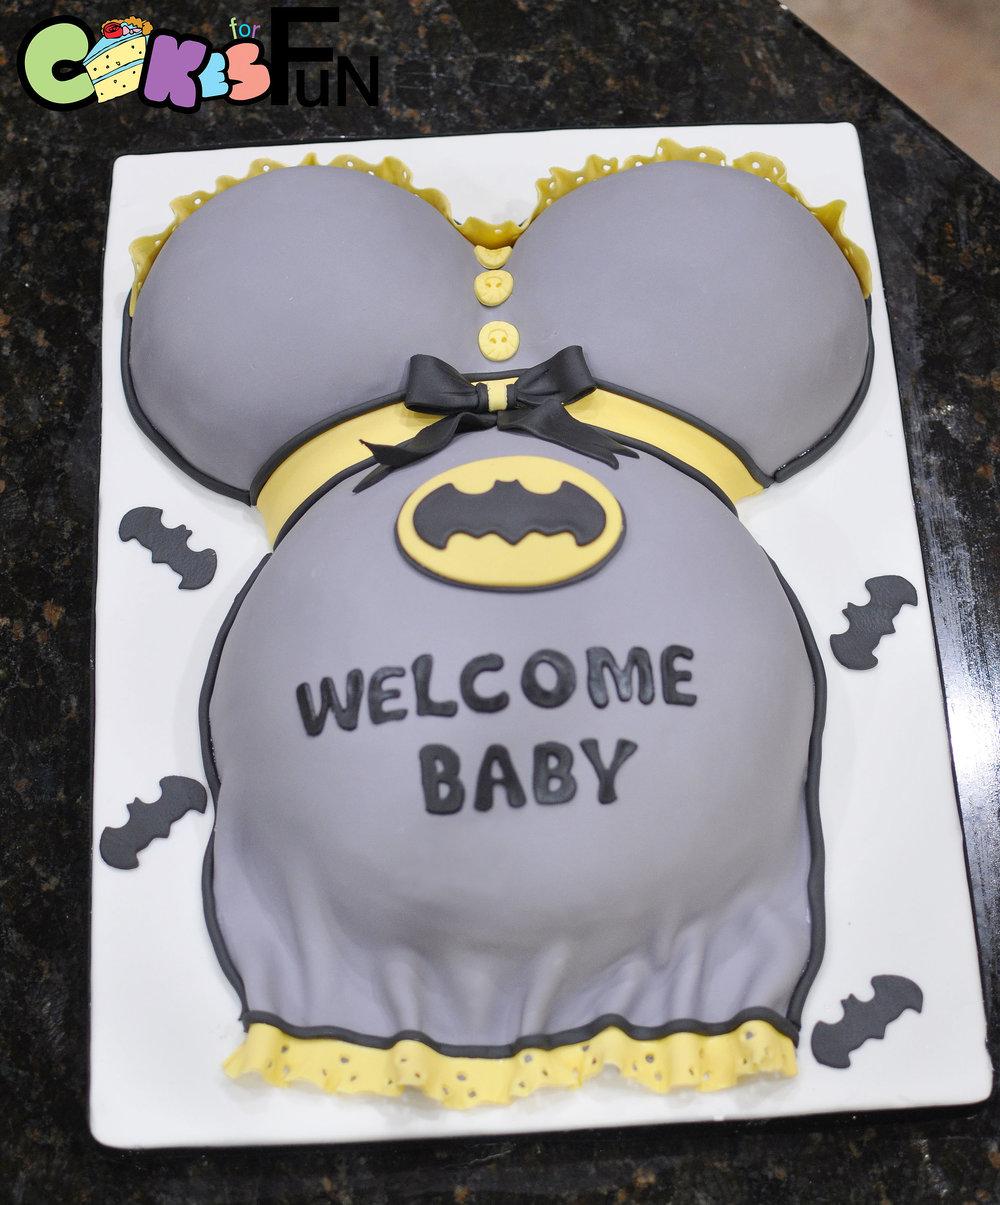 batman baby bump-hukill-02-10-18-2.jpg